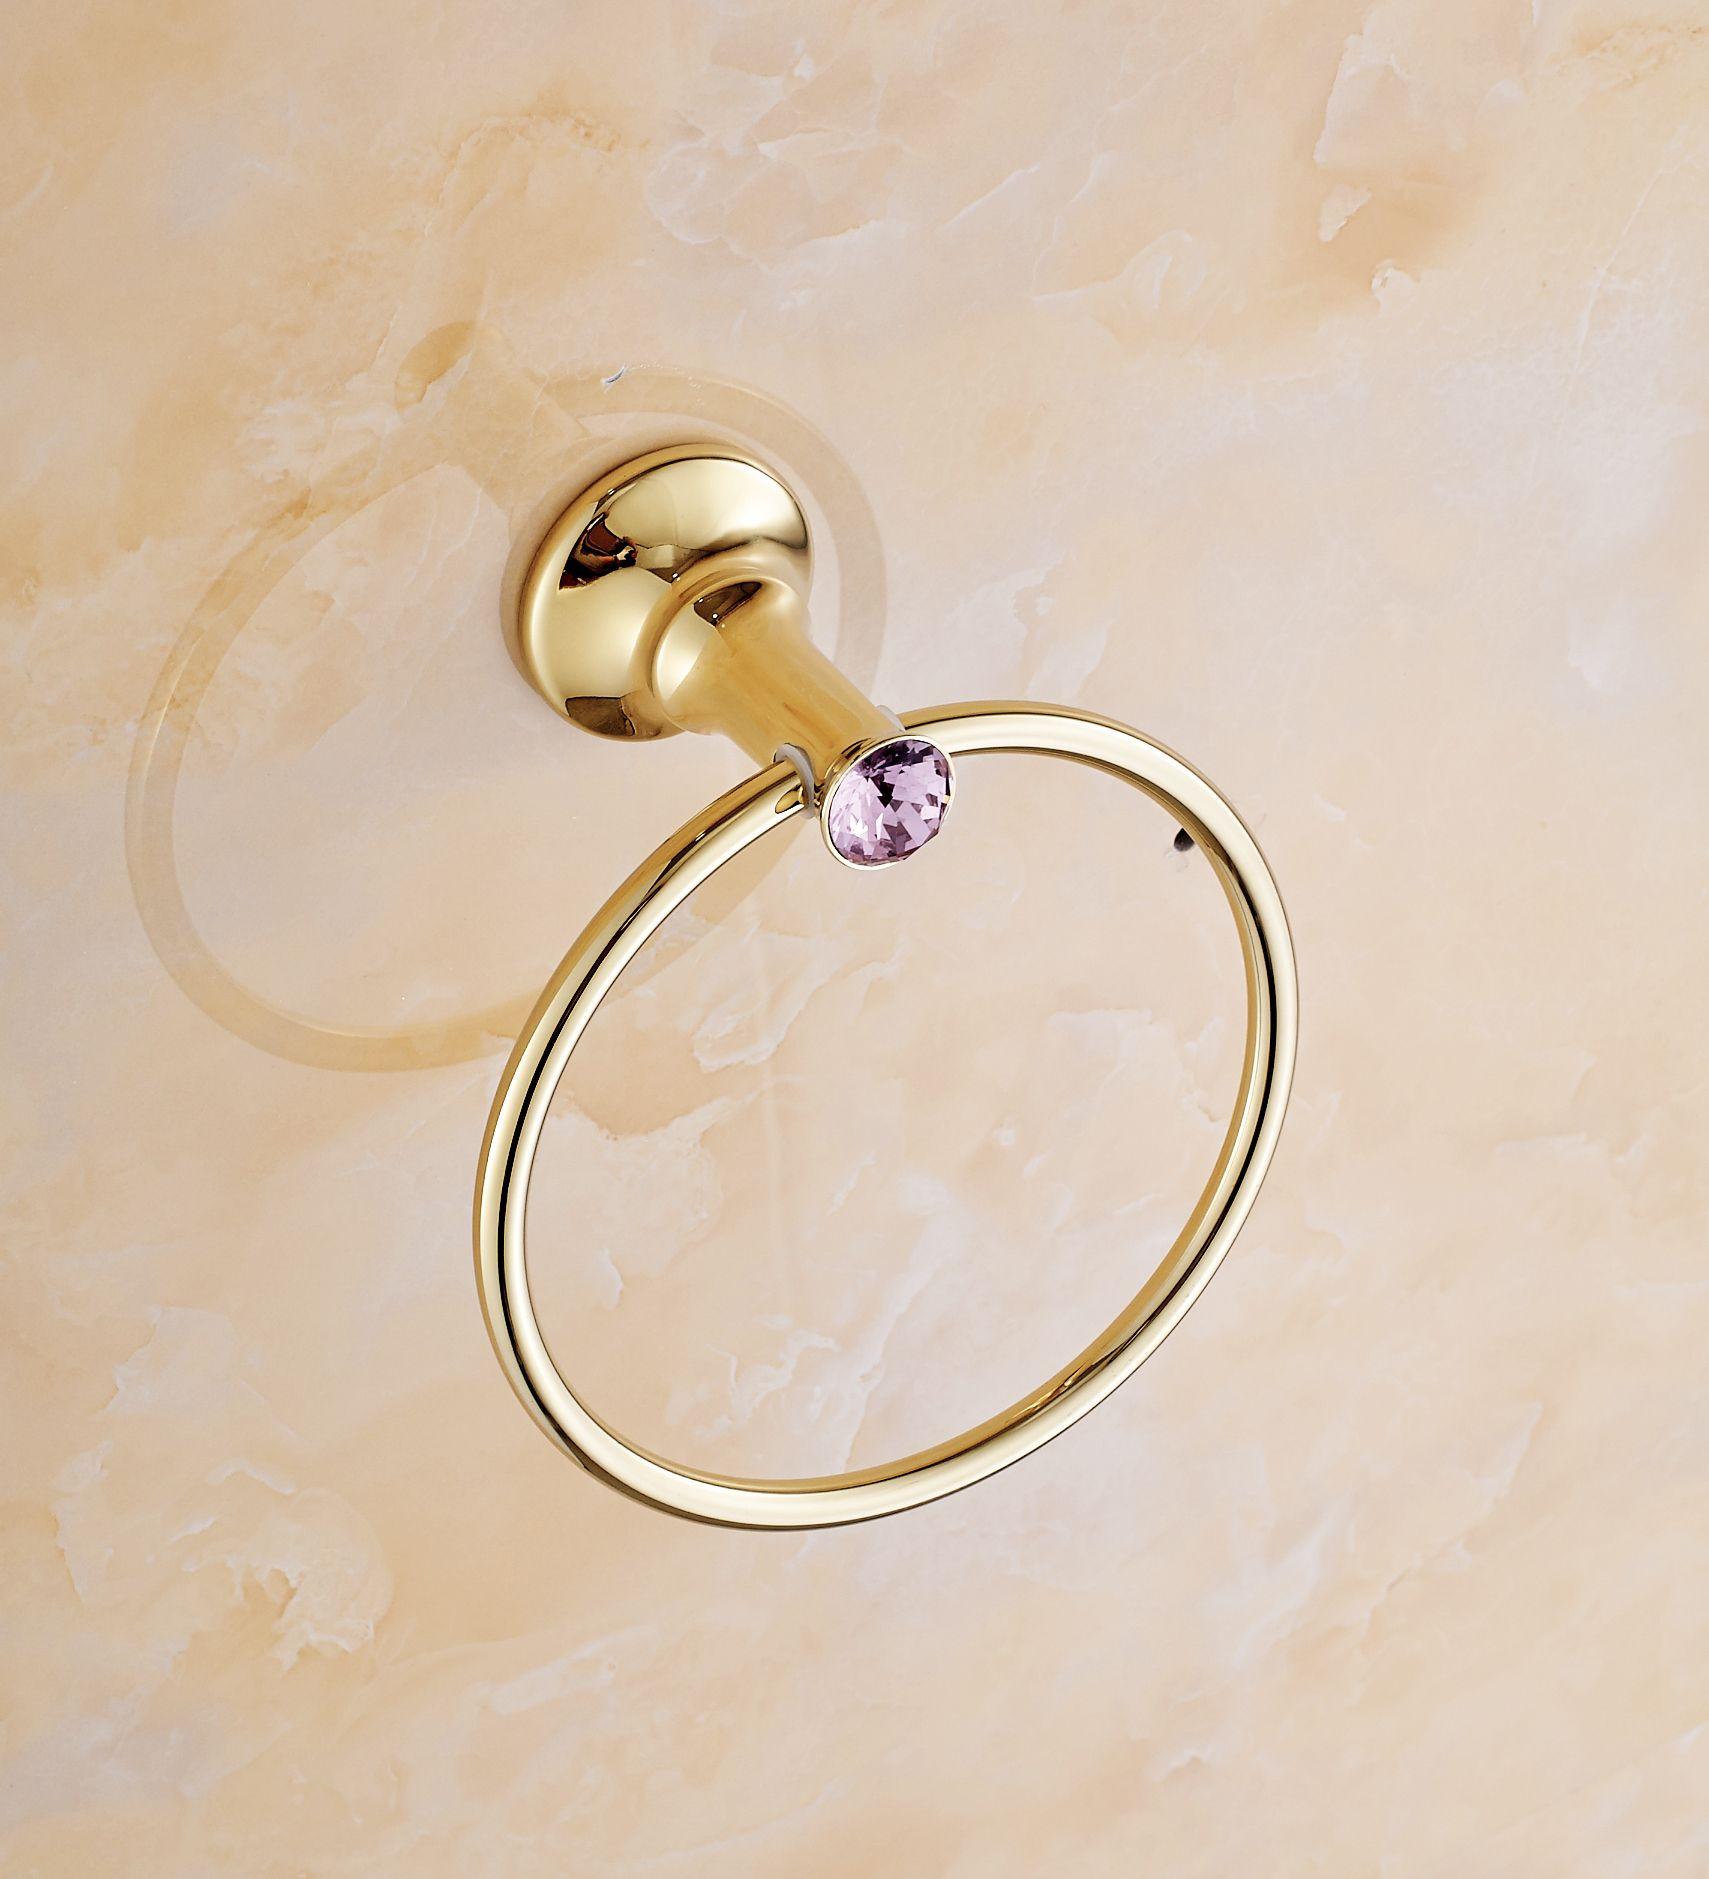 Di Revival Wall Mounted Towel Ring Holder Bath Hand Towel Holder Brass Hand Towel Holder Towel Holder Towel Rings